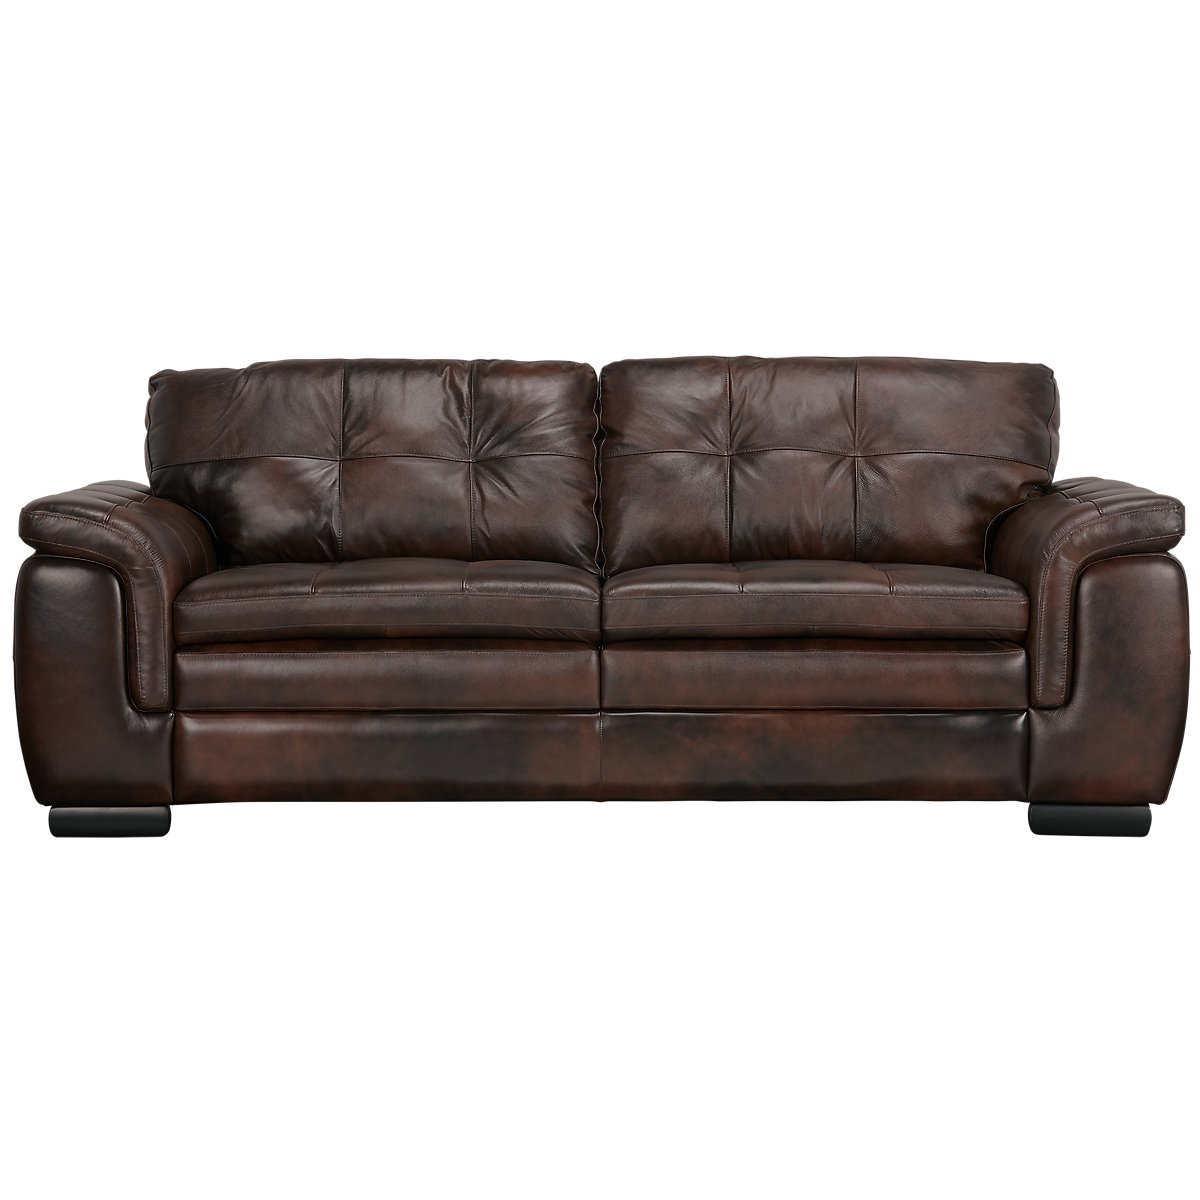 Trevor Dark Brown Leather Sofa